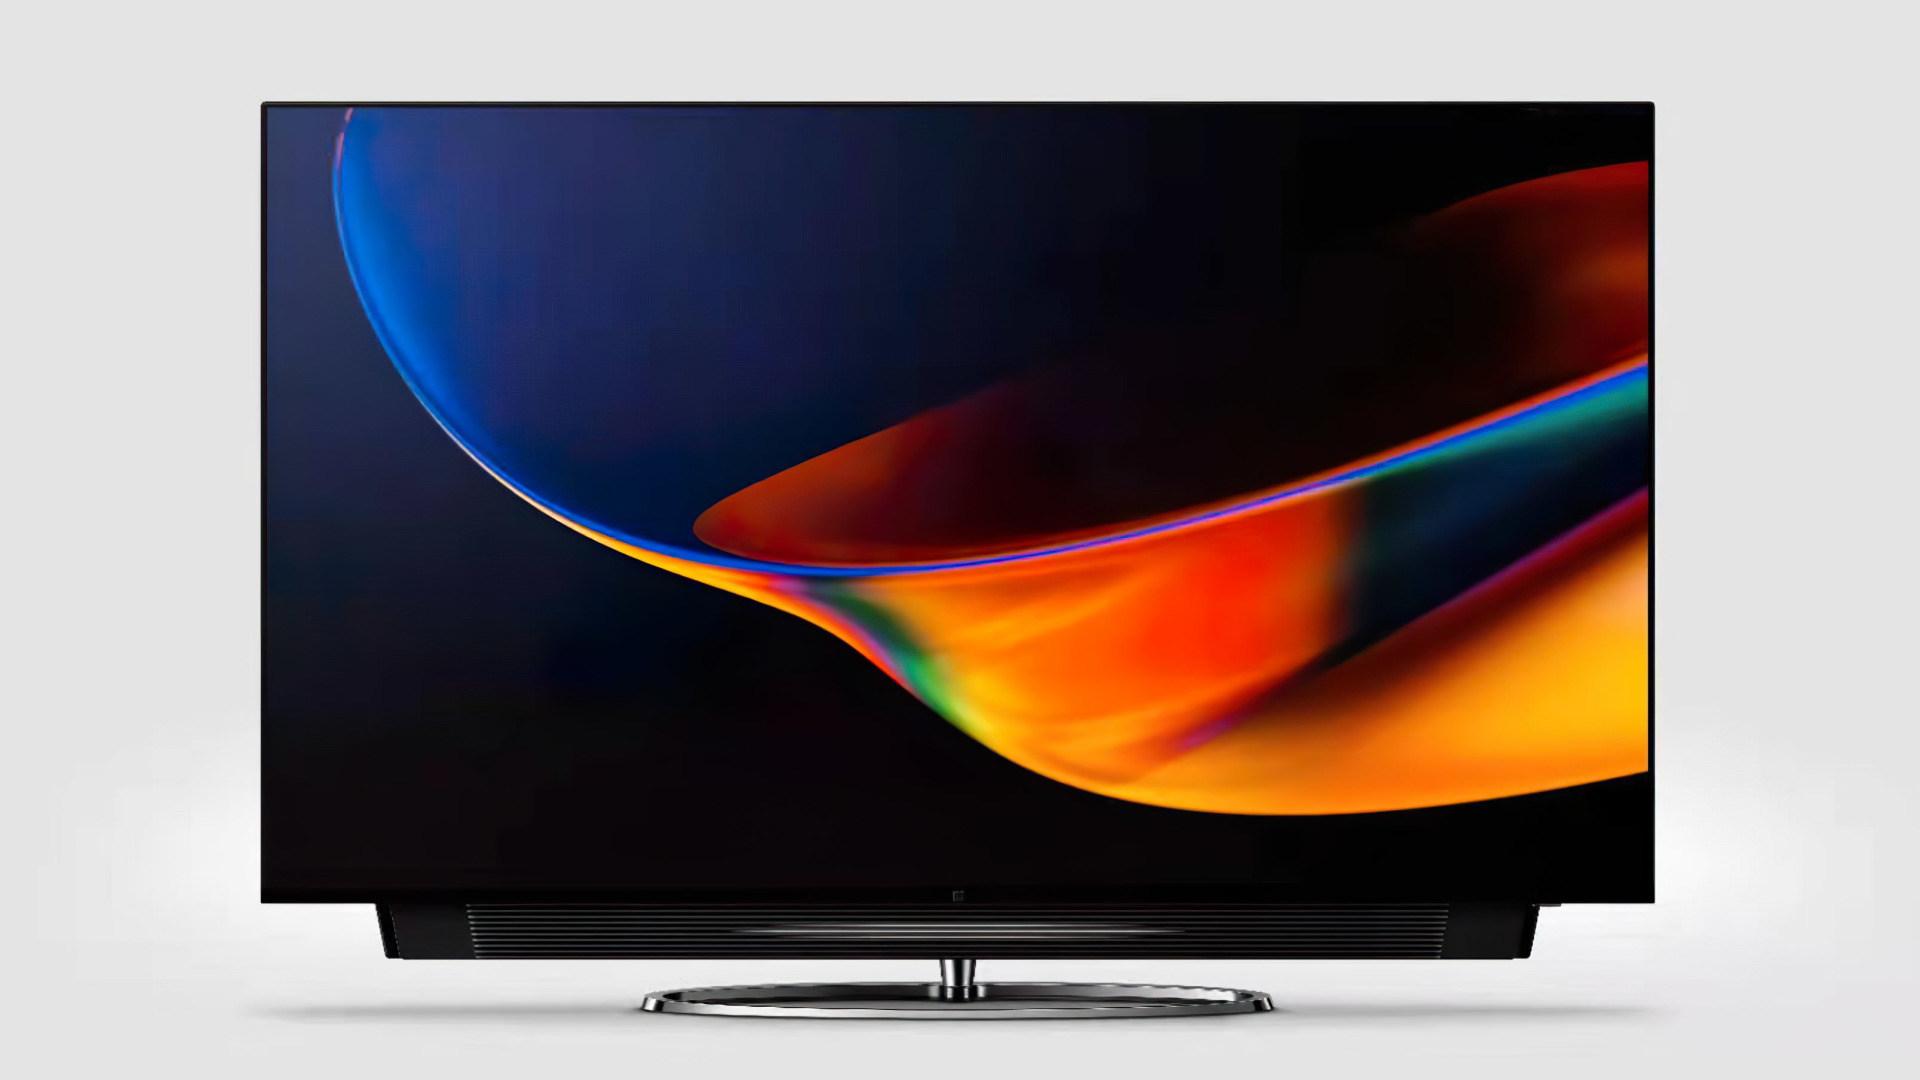 Tv, Fernseher, Android TV, QLED, OnePlus TV, OnePlus TV Q1 Pro, OnePlus TV Q1